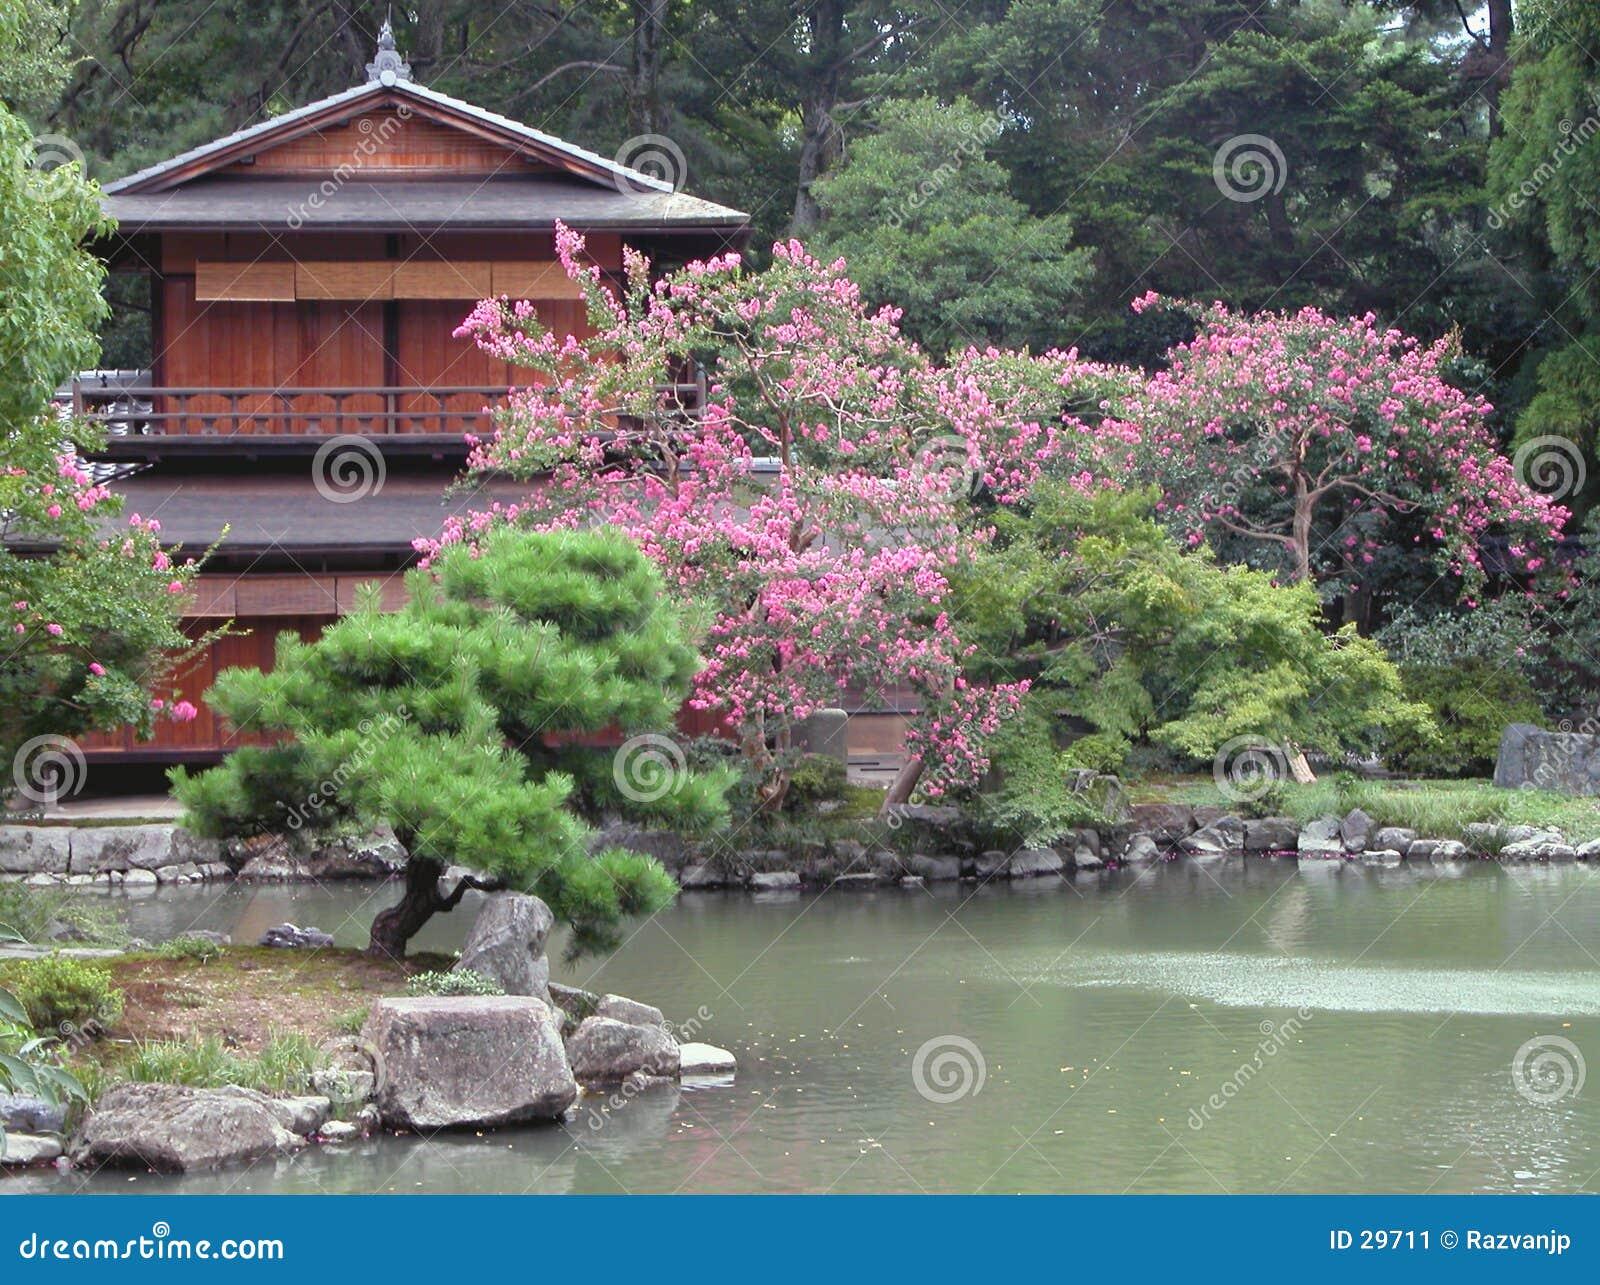 maison japonaise et son jardin image stock image 29711. Black Bedroom Furniture Sets. Home Design Ideas